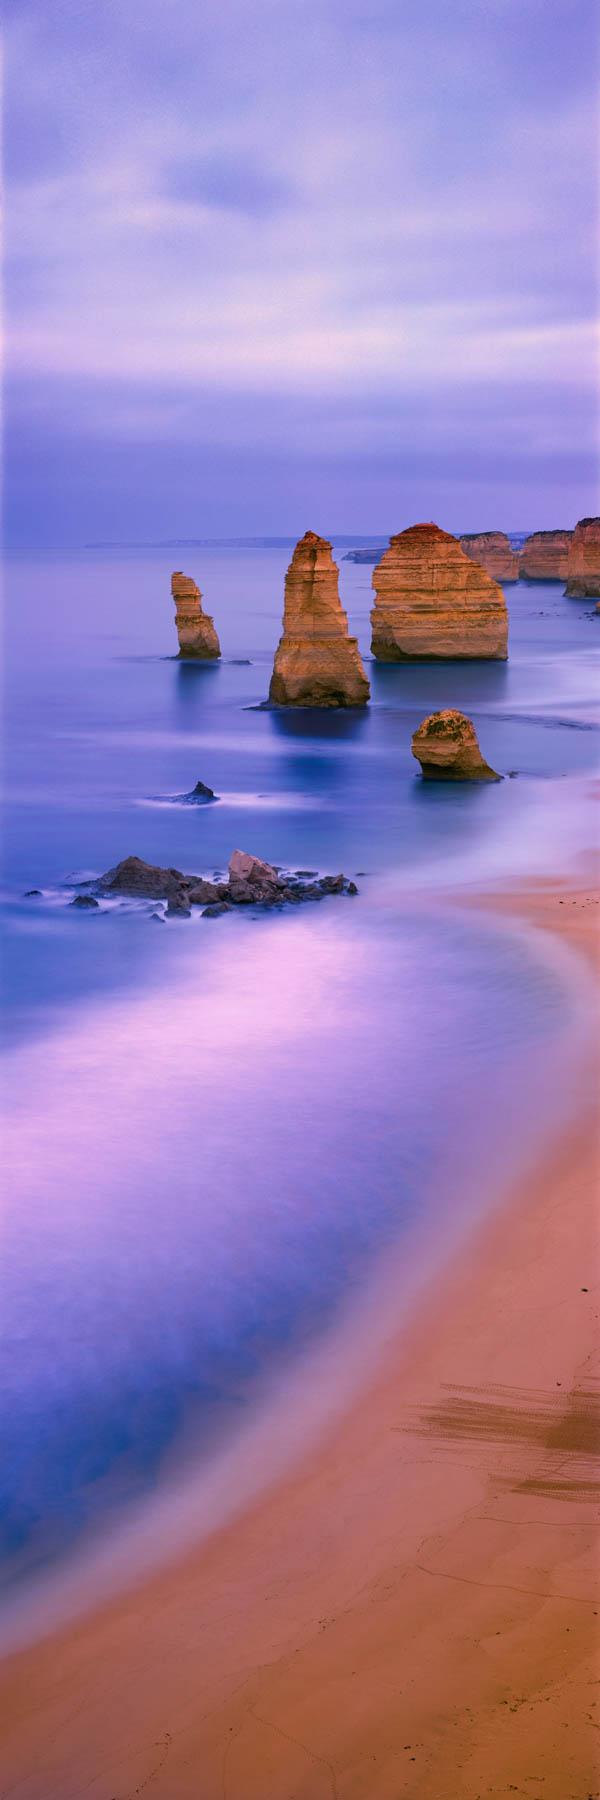 Twilight at The Twelve Apostles, Victoria Australia.